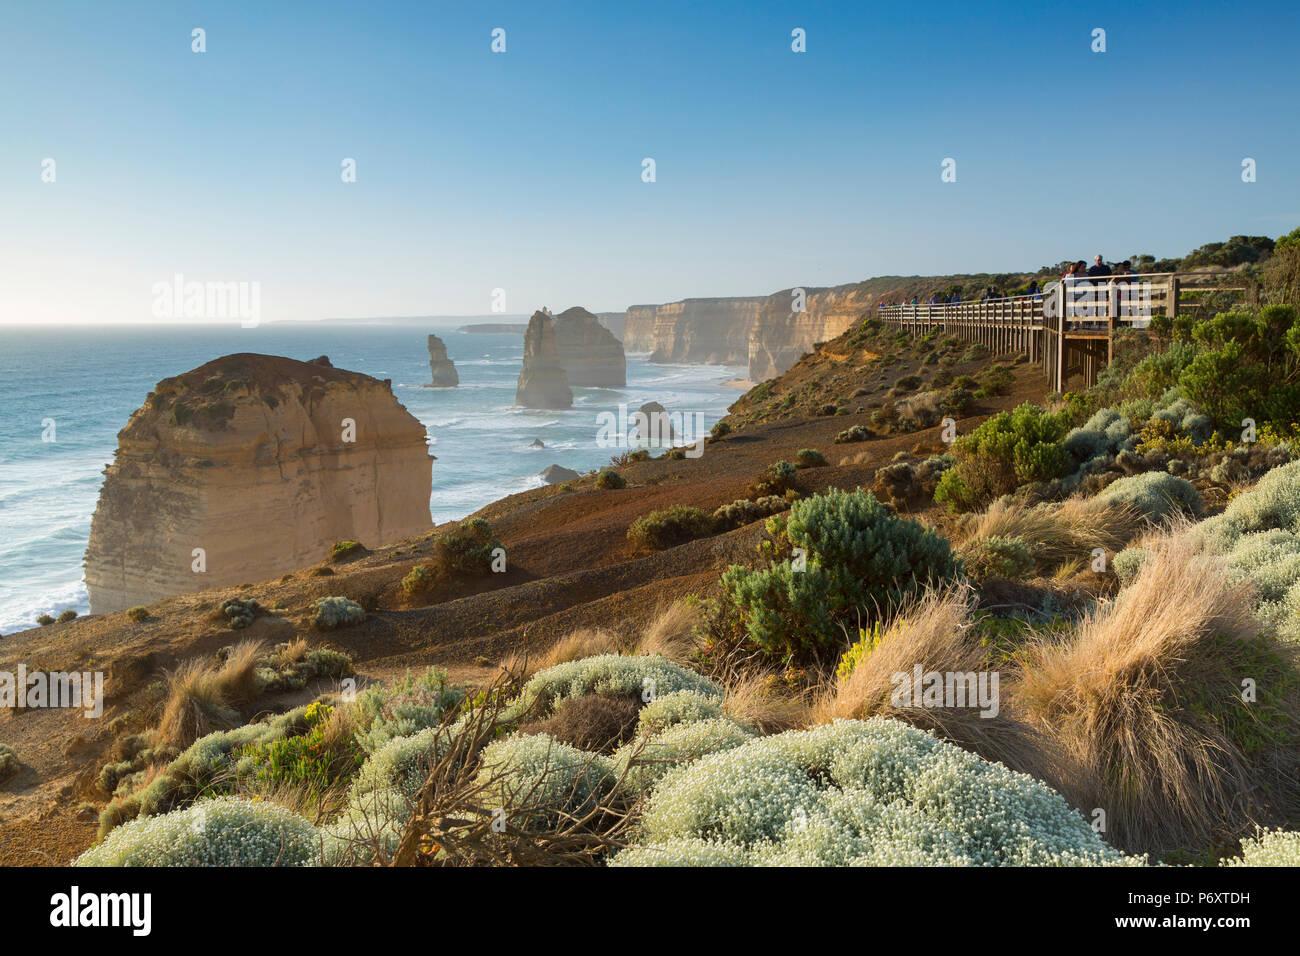 Twelve Apostles, Port Campbell National Park, Great Ocean Road, Victoria, Australia Stock Photo